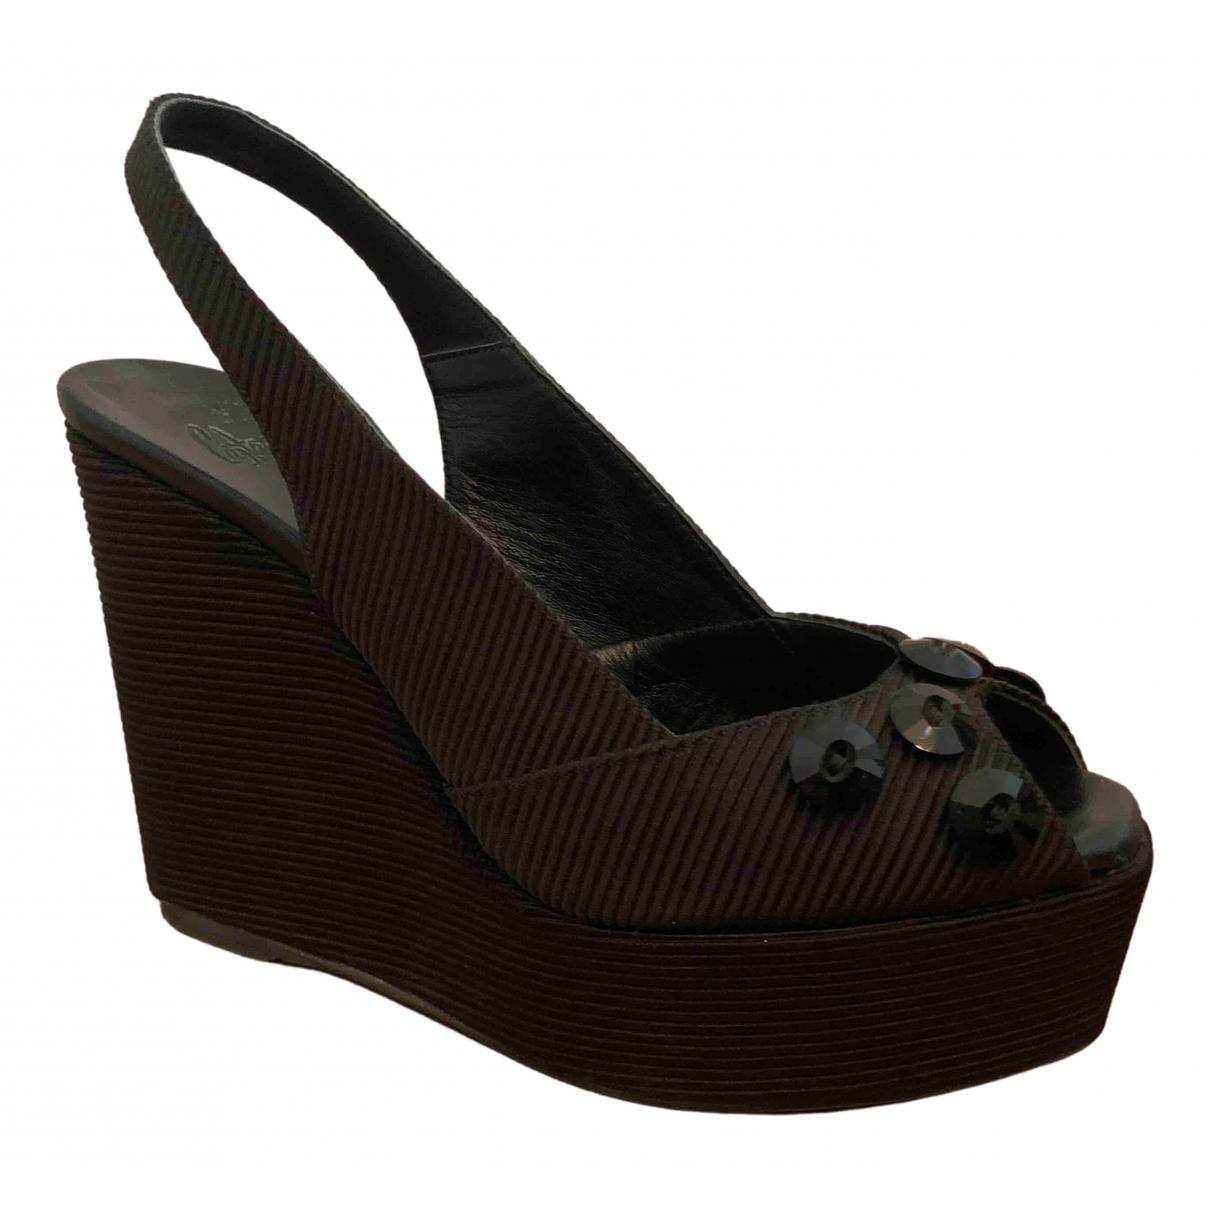 Castaner N Black Cloth Sandals for Women 39 EU